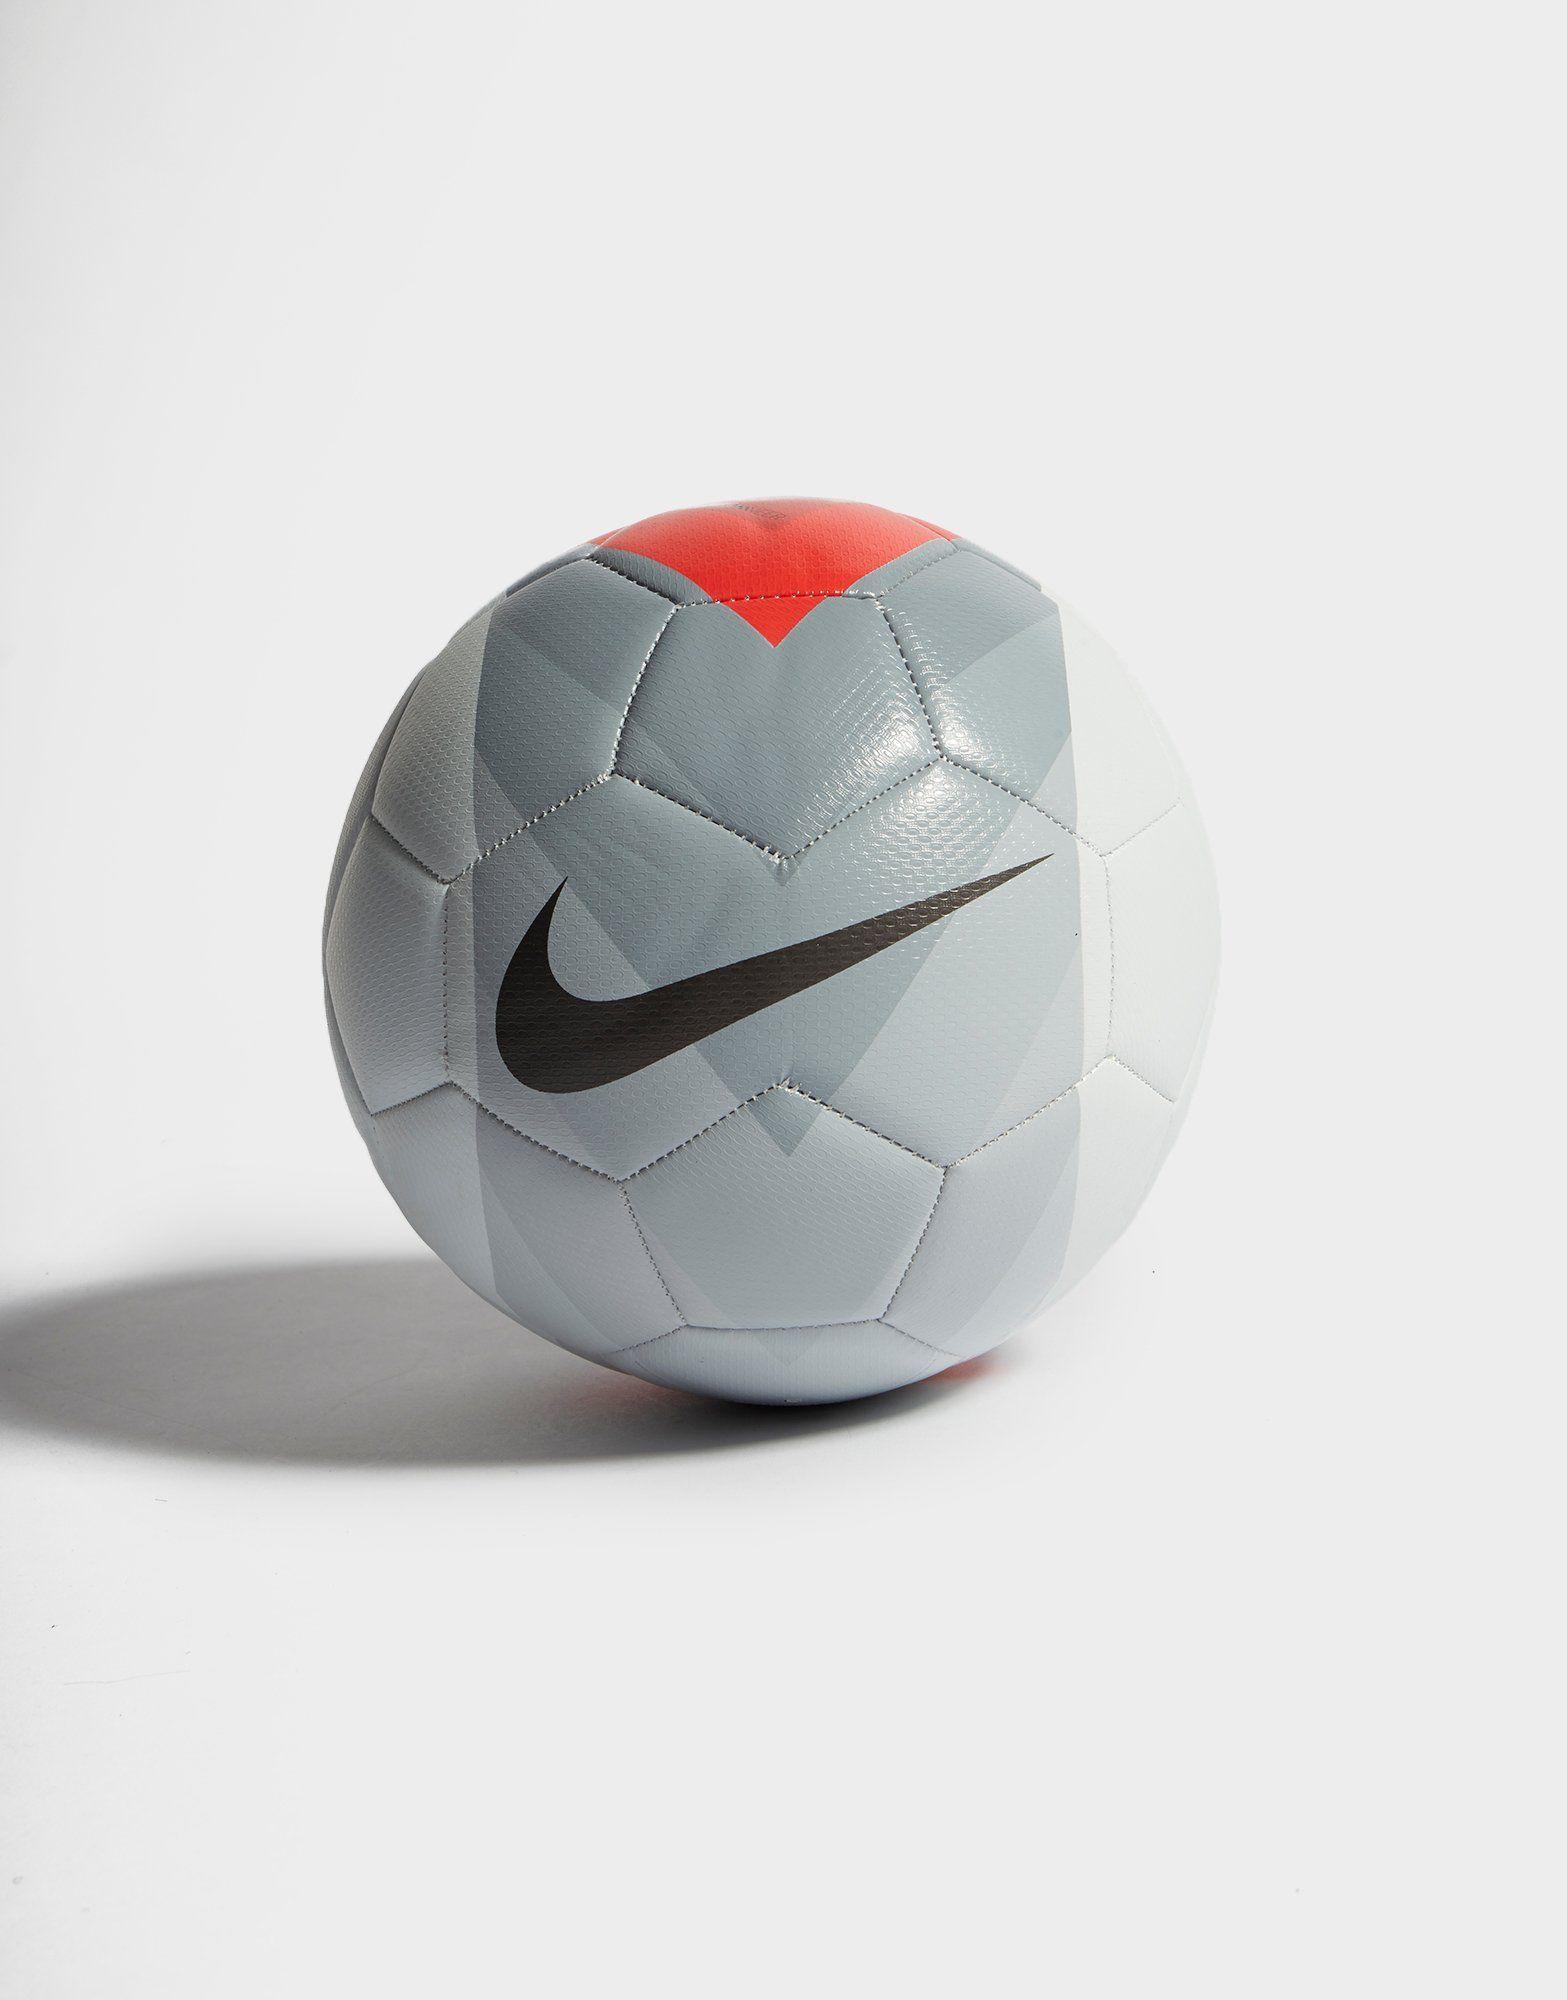 Nike Future 10 Football